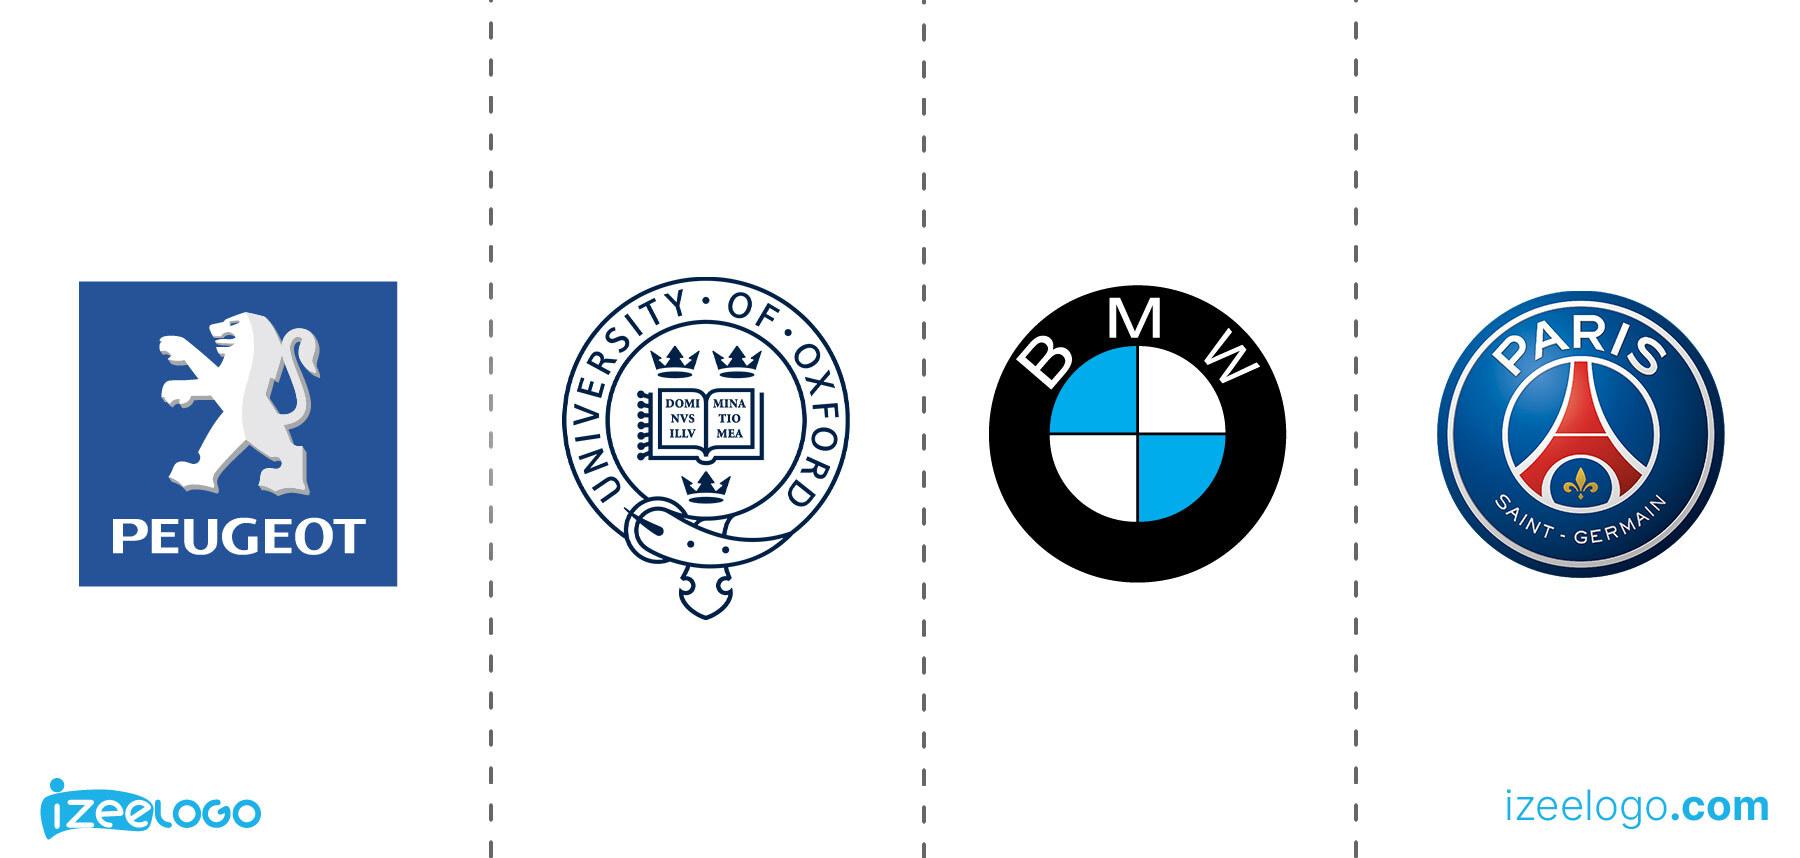 Exemples de logo emblème : logo PSG PNG, logo Peugeot PNG, logo BMW PNG et Oxford University logo.